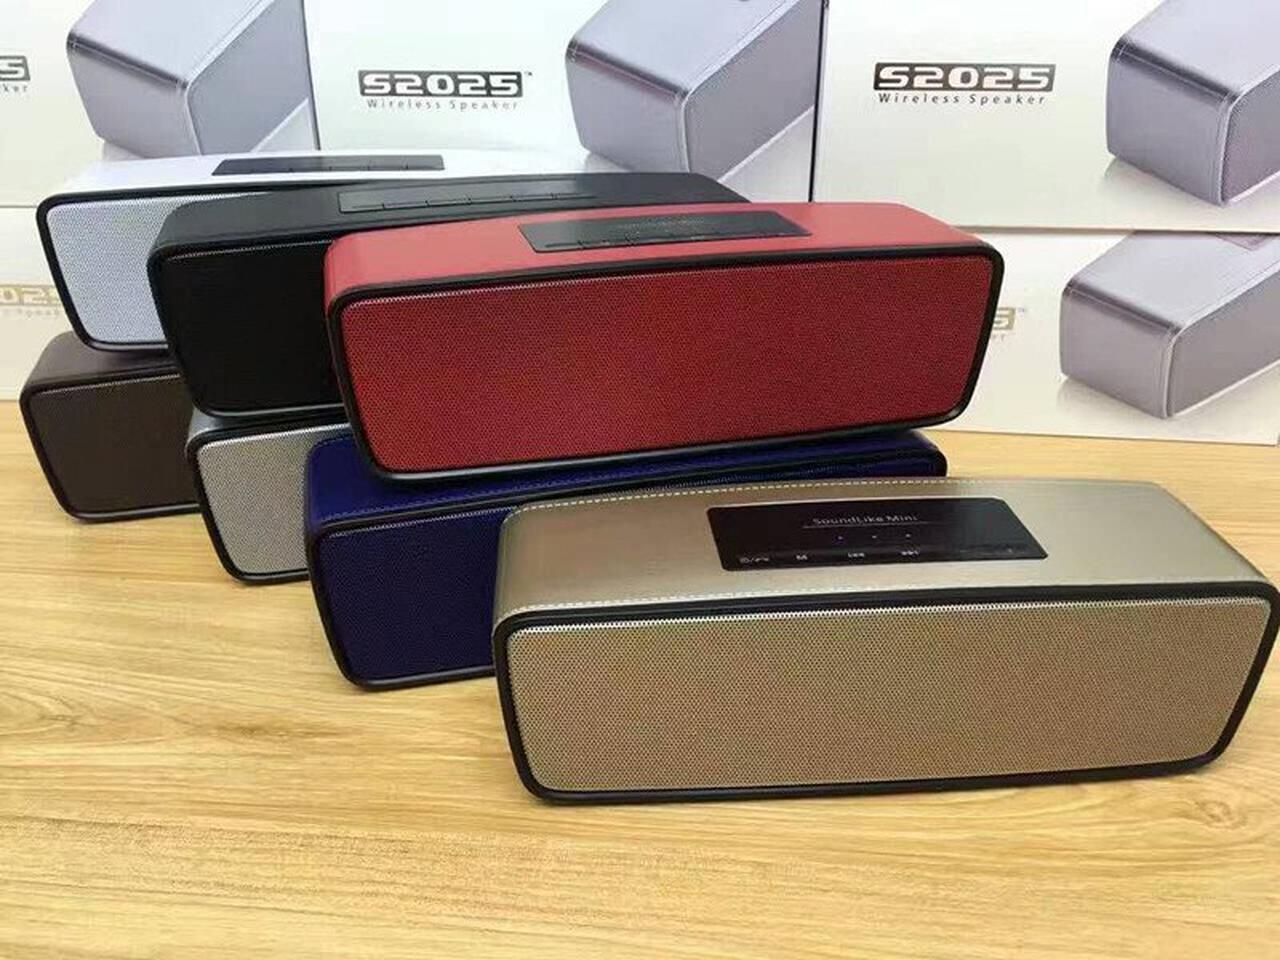 Bose Soundlink Mini - S2025 สินค้าไม่ใช่ของแท้ รูปที่ 3